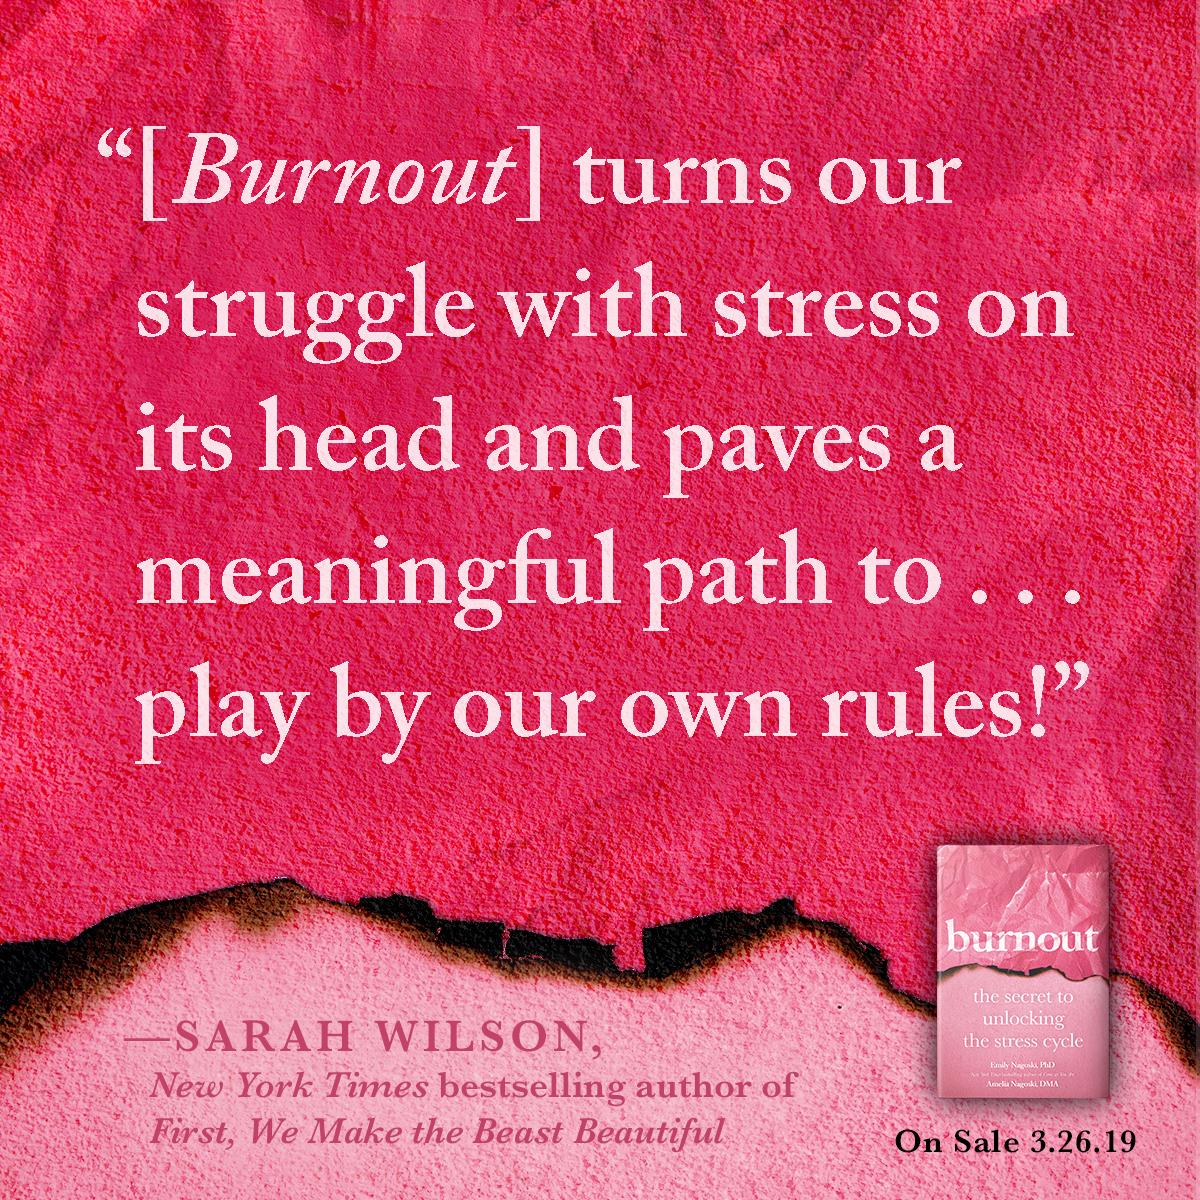 Burnout_Sarah Wilson quote card.jpg.jpg